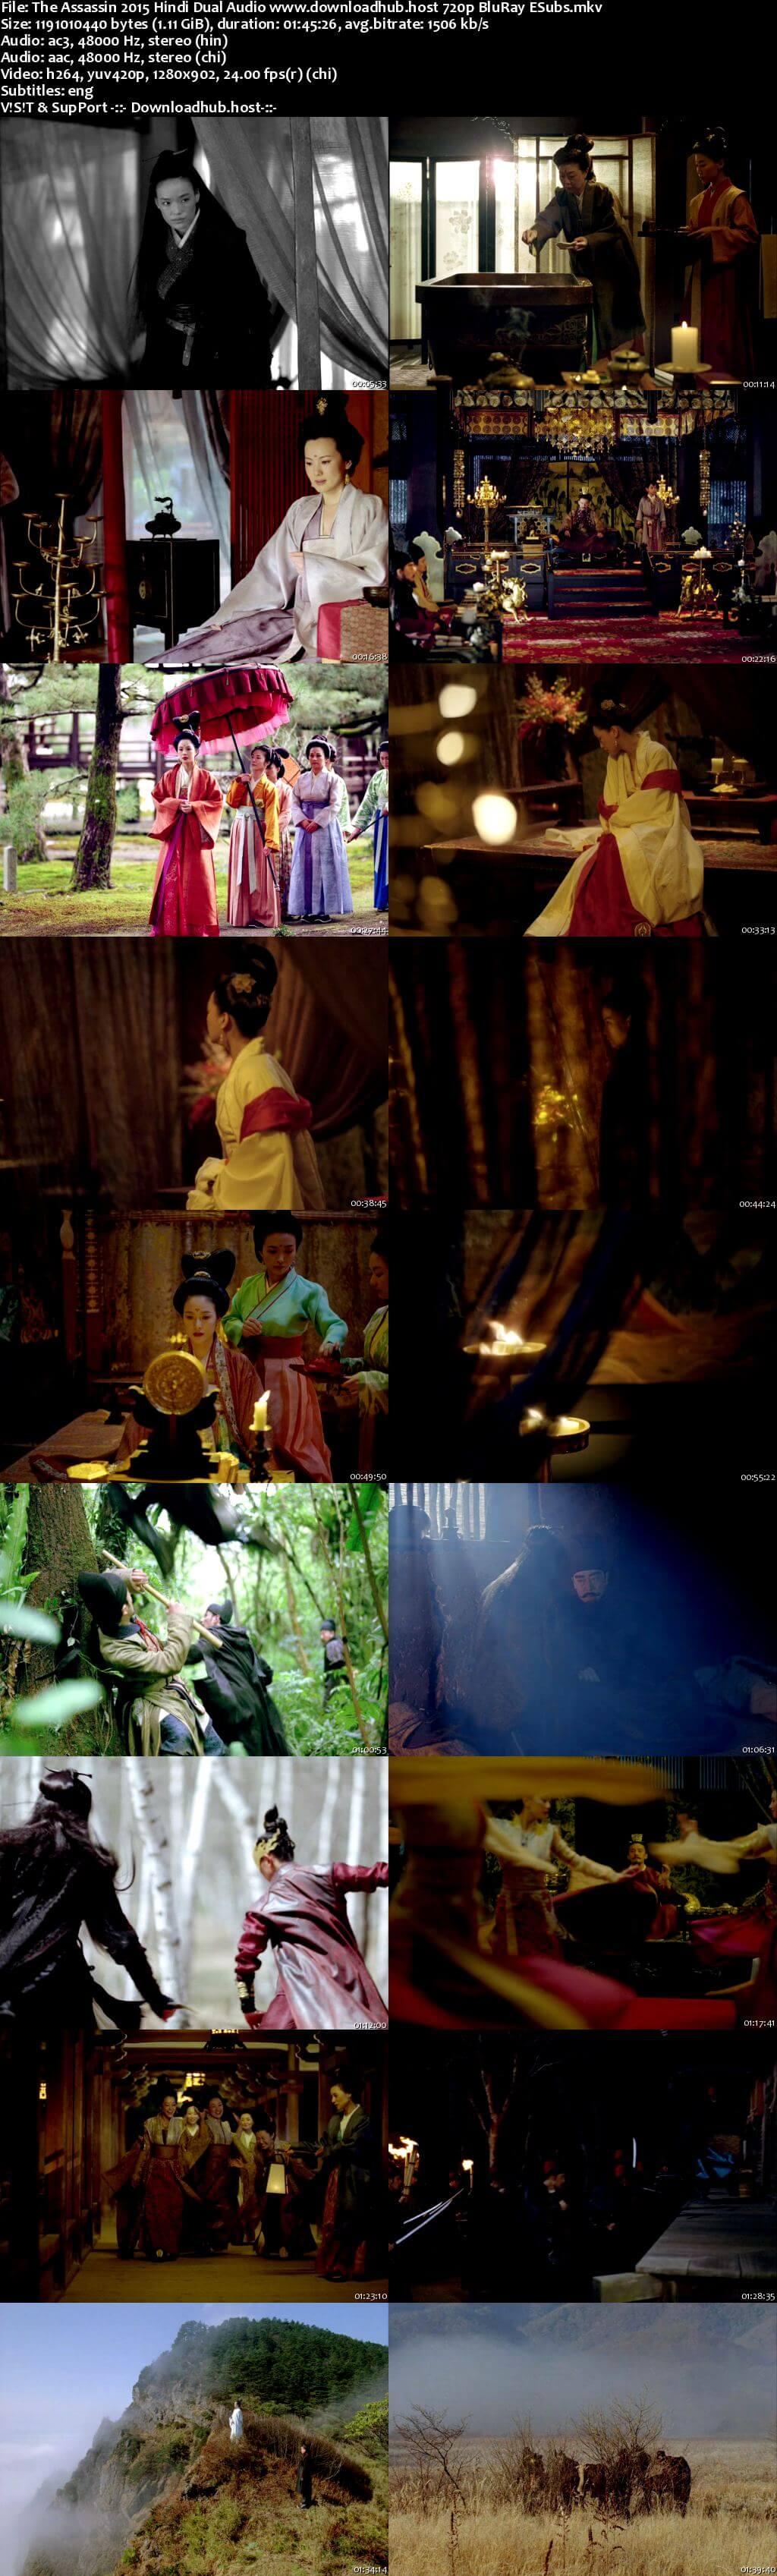 The Assassin 2015 Hindi Dual Audio 720p BluRay ESubs